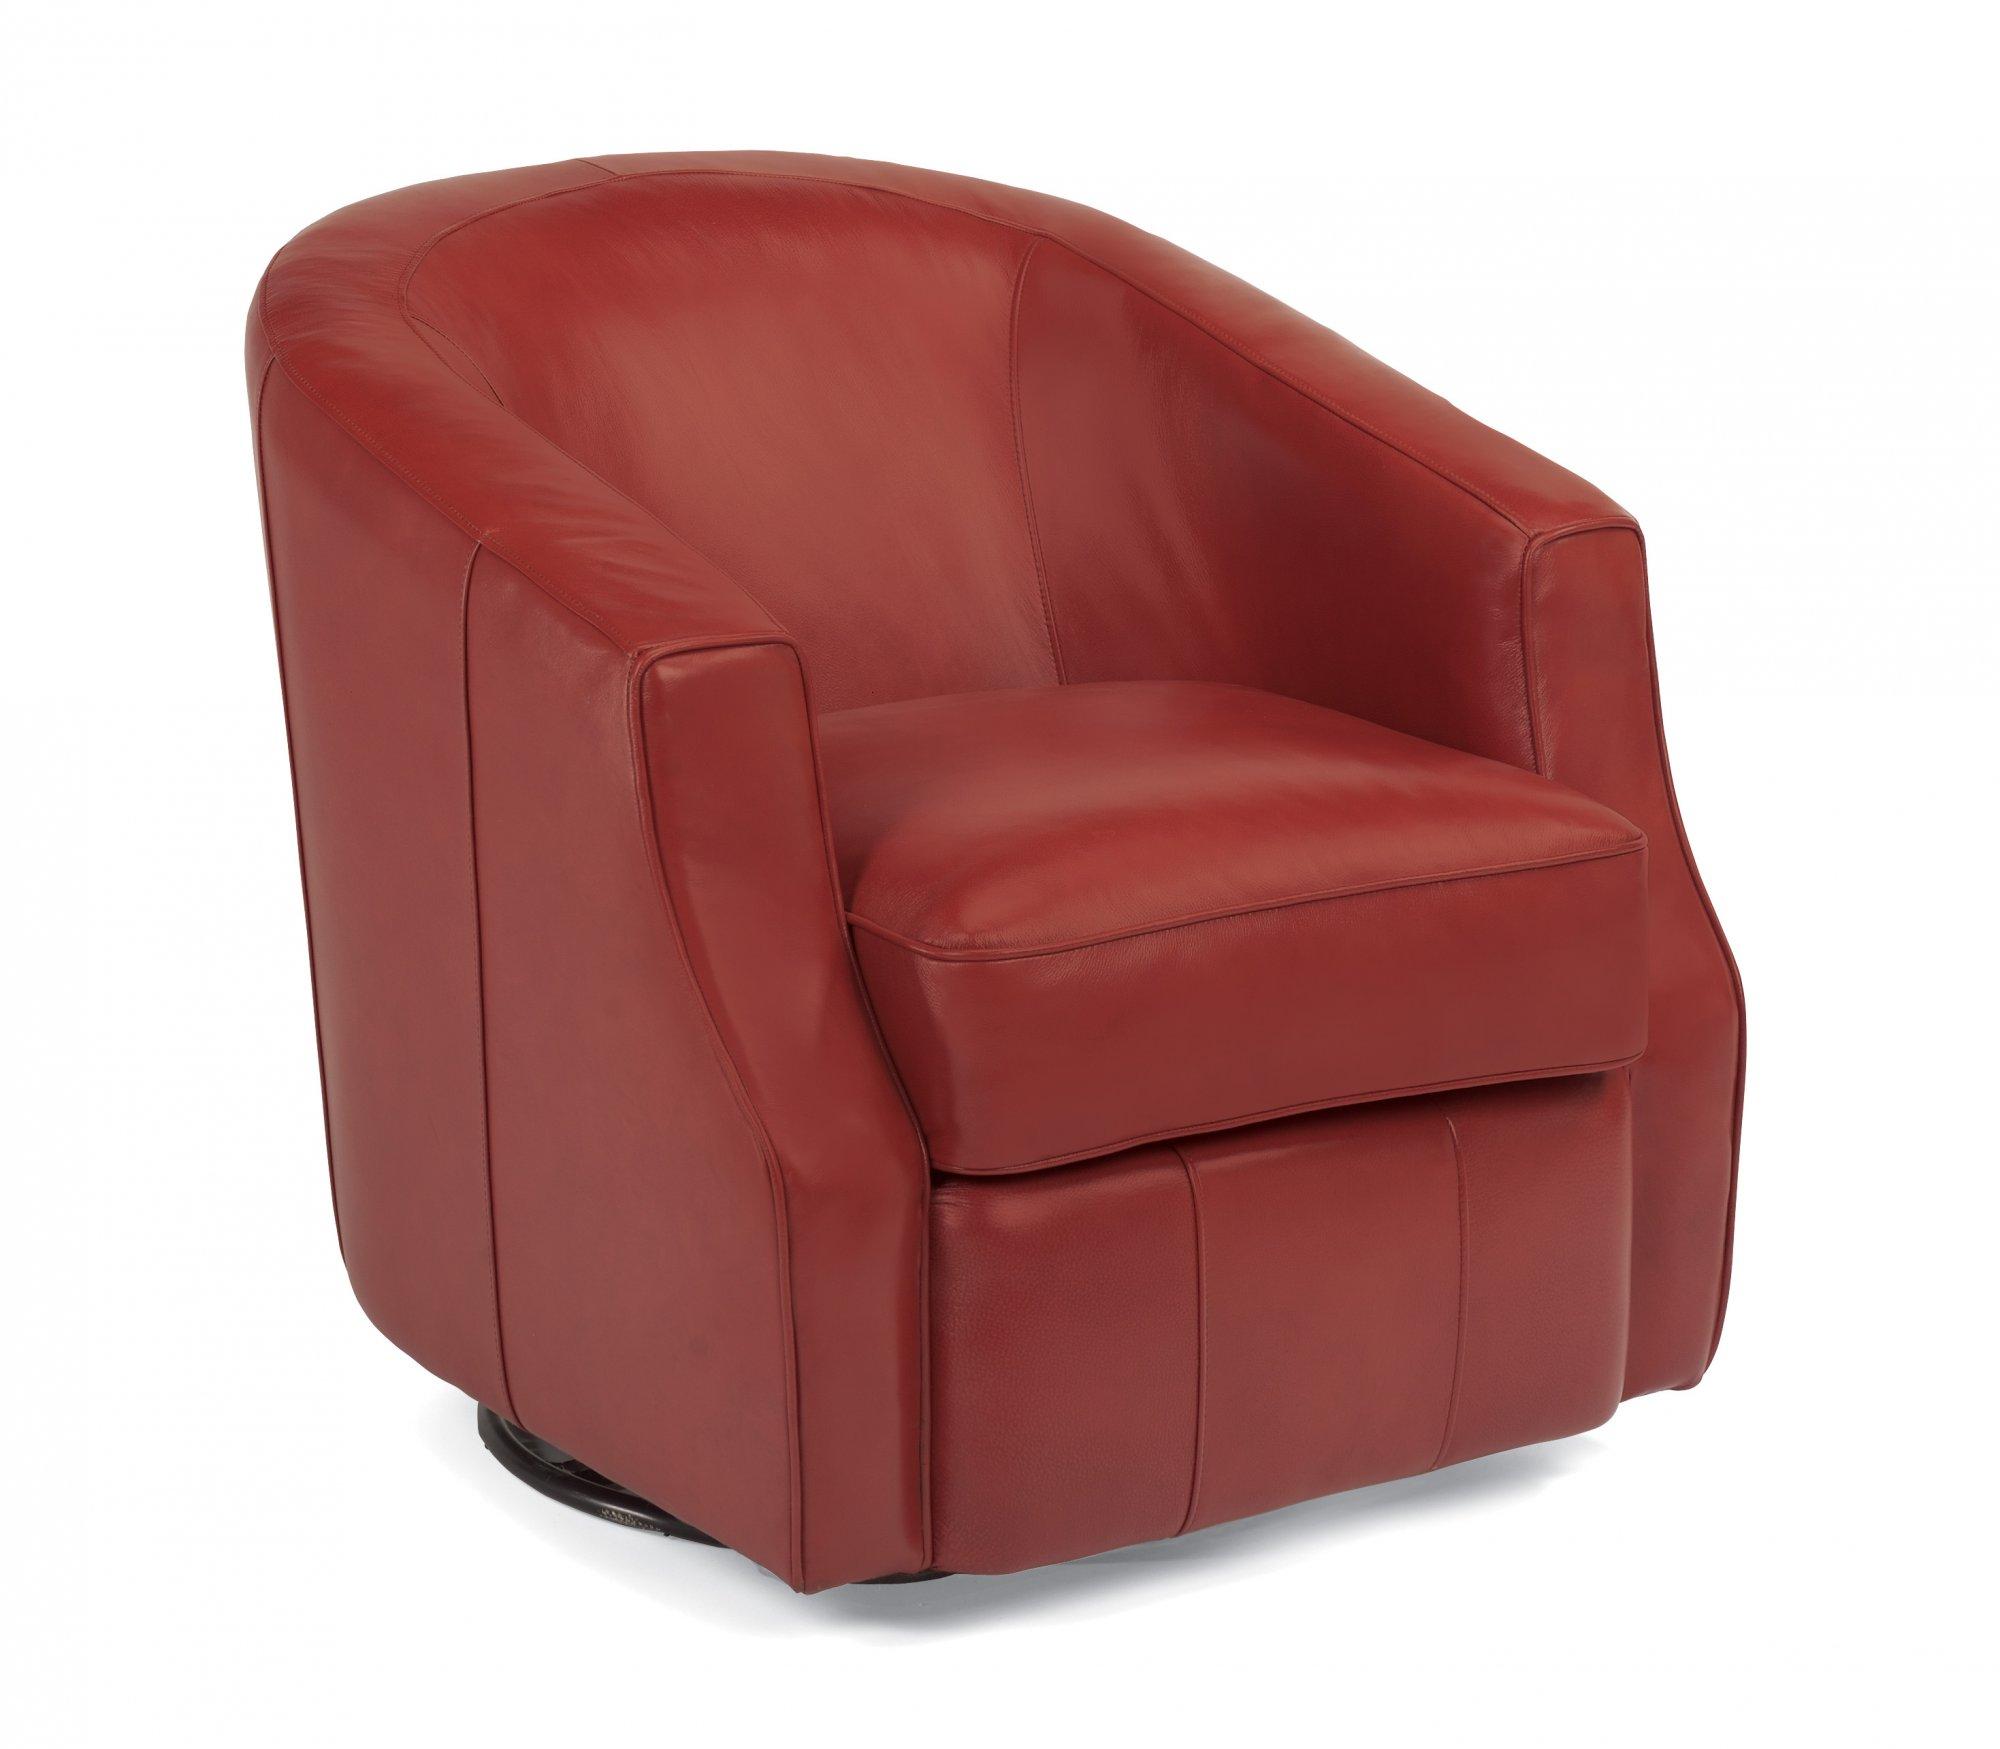 Moonwalk – Leather Swivel Glider Chair